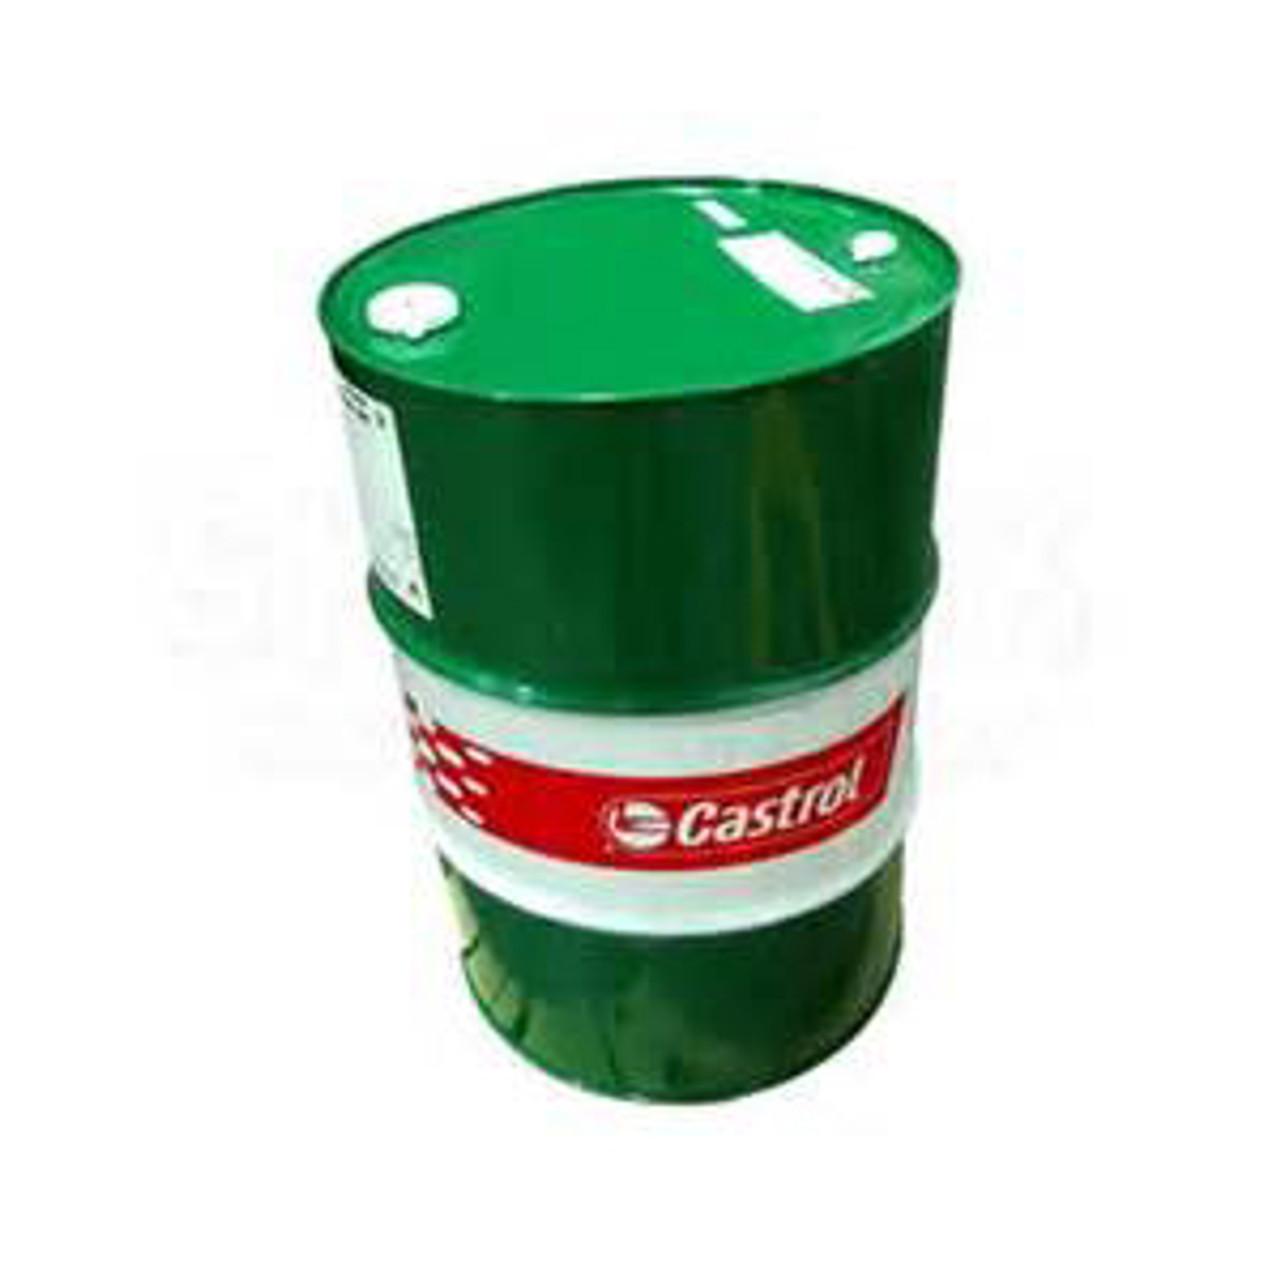 santie oil company castrol edge 5w 30 c3 55 gallon drum. Black Bedroom Furniture Sets. Home Design Ideas